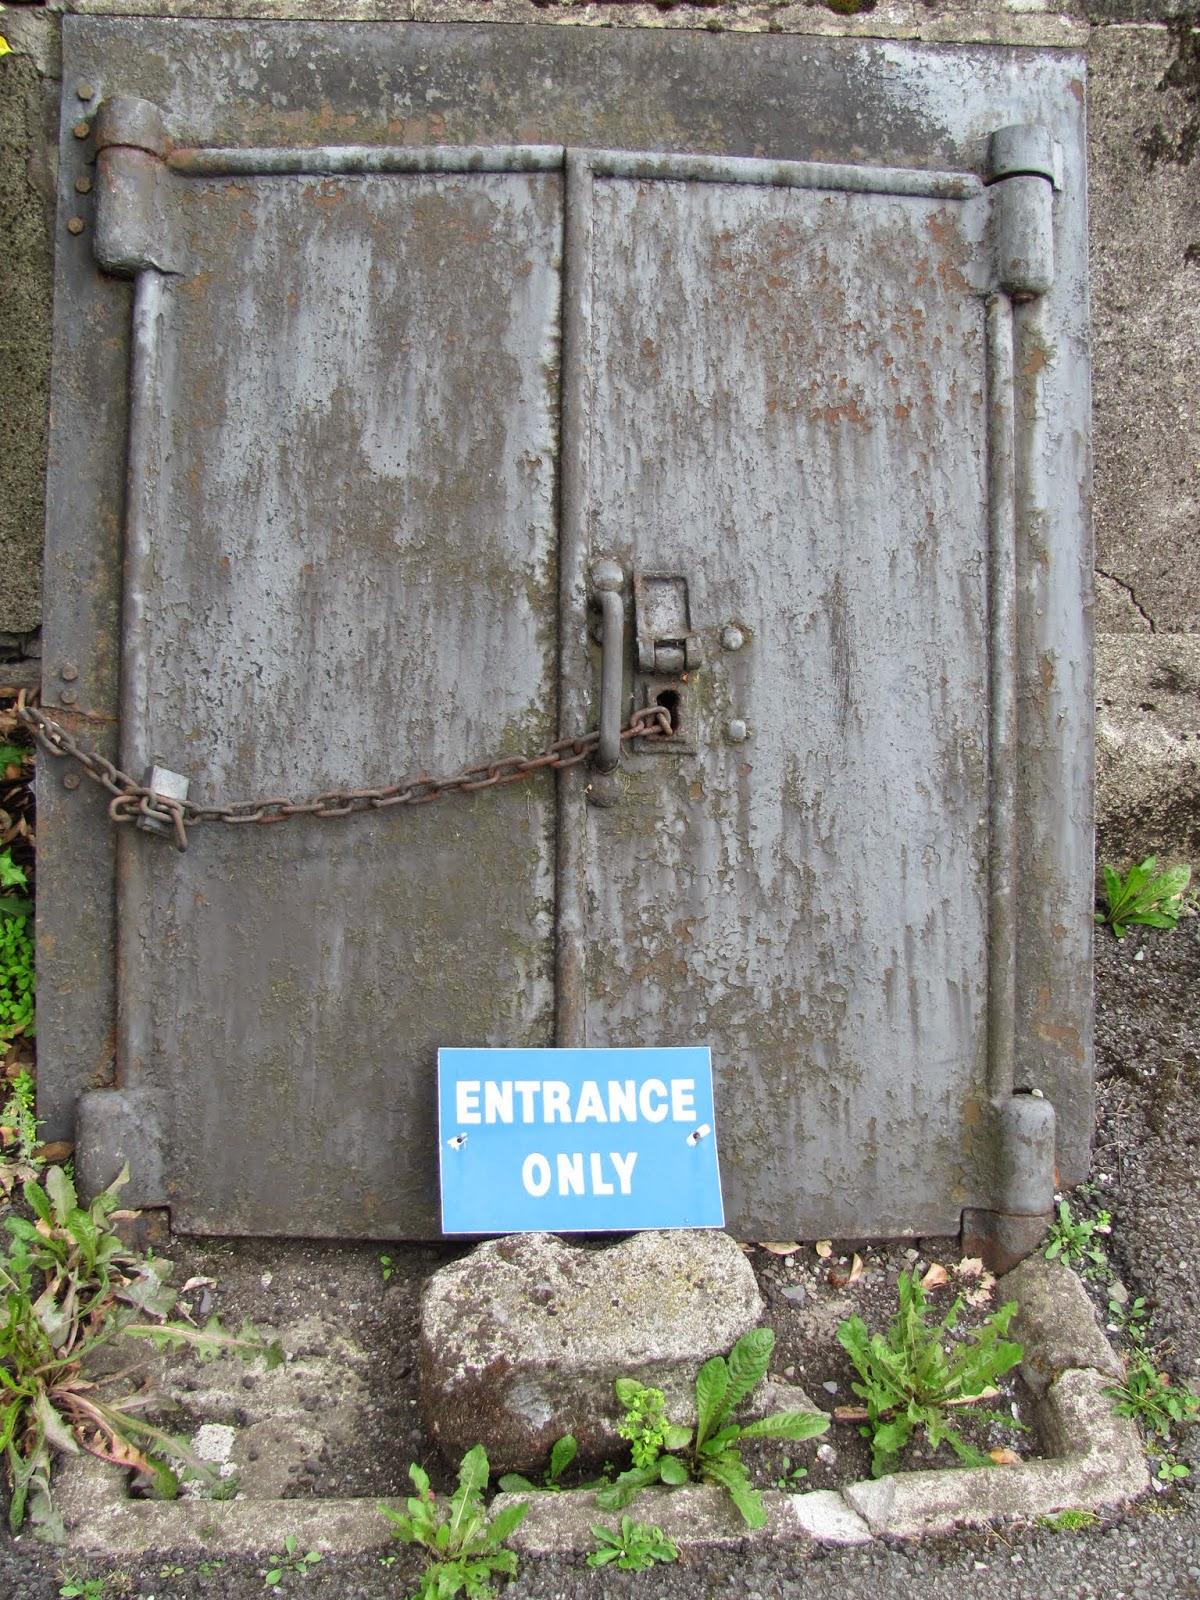 Entrance Only- No Exit! St. Michan's Church Dublin, Ireland